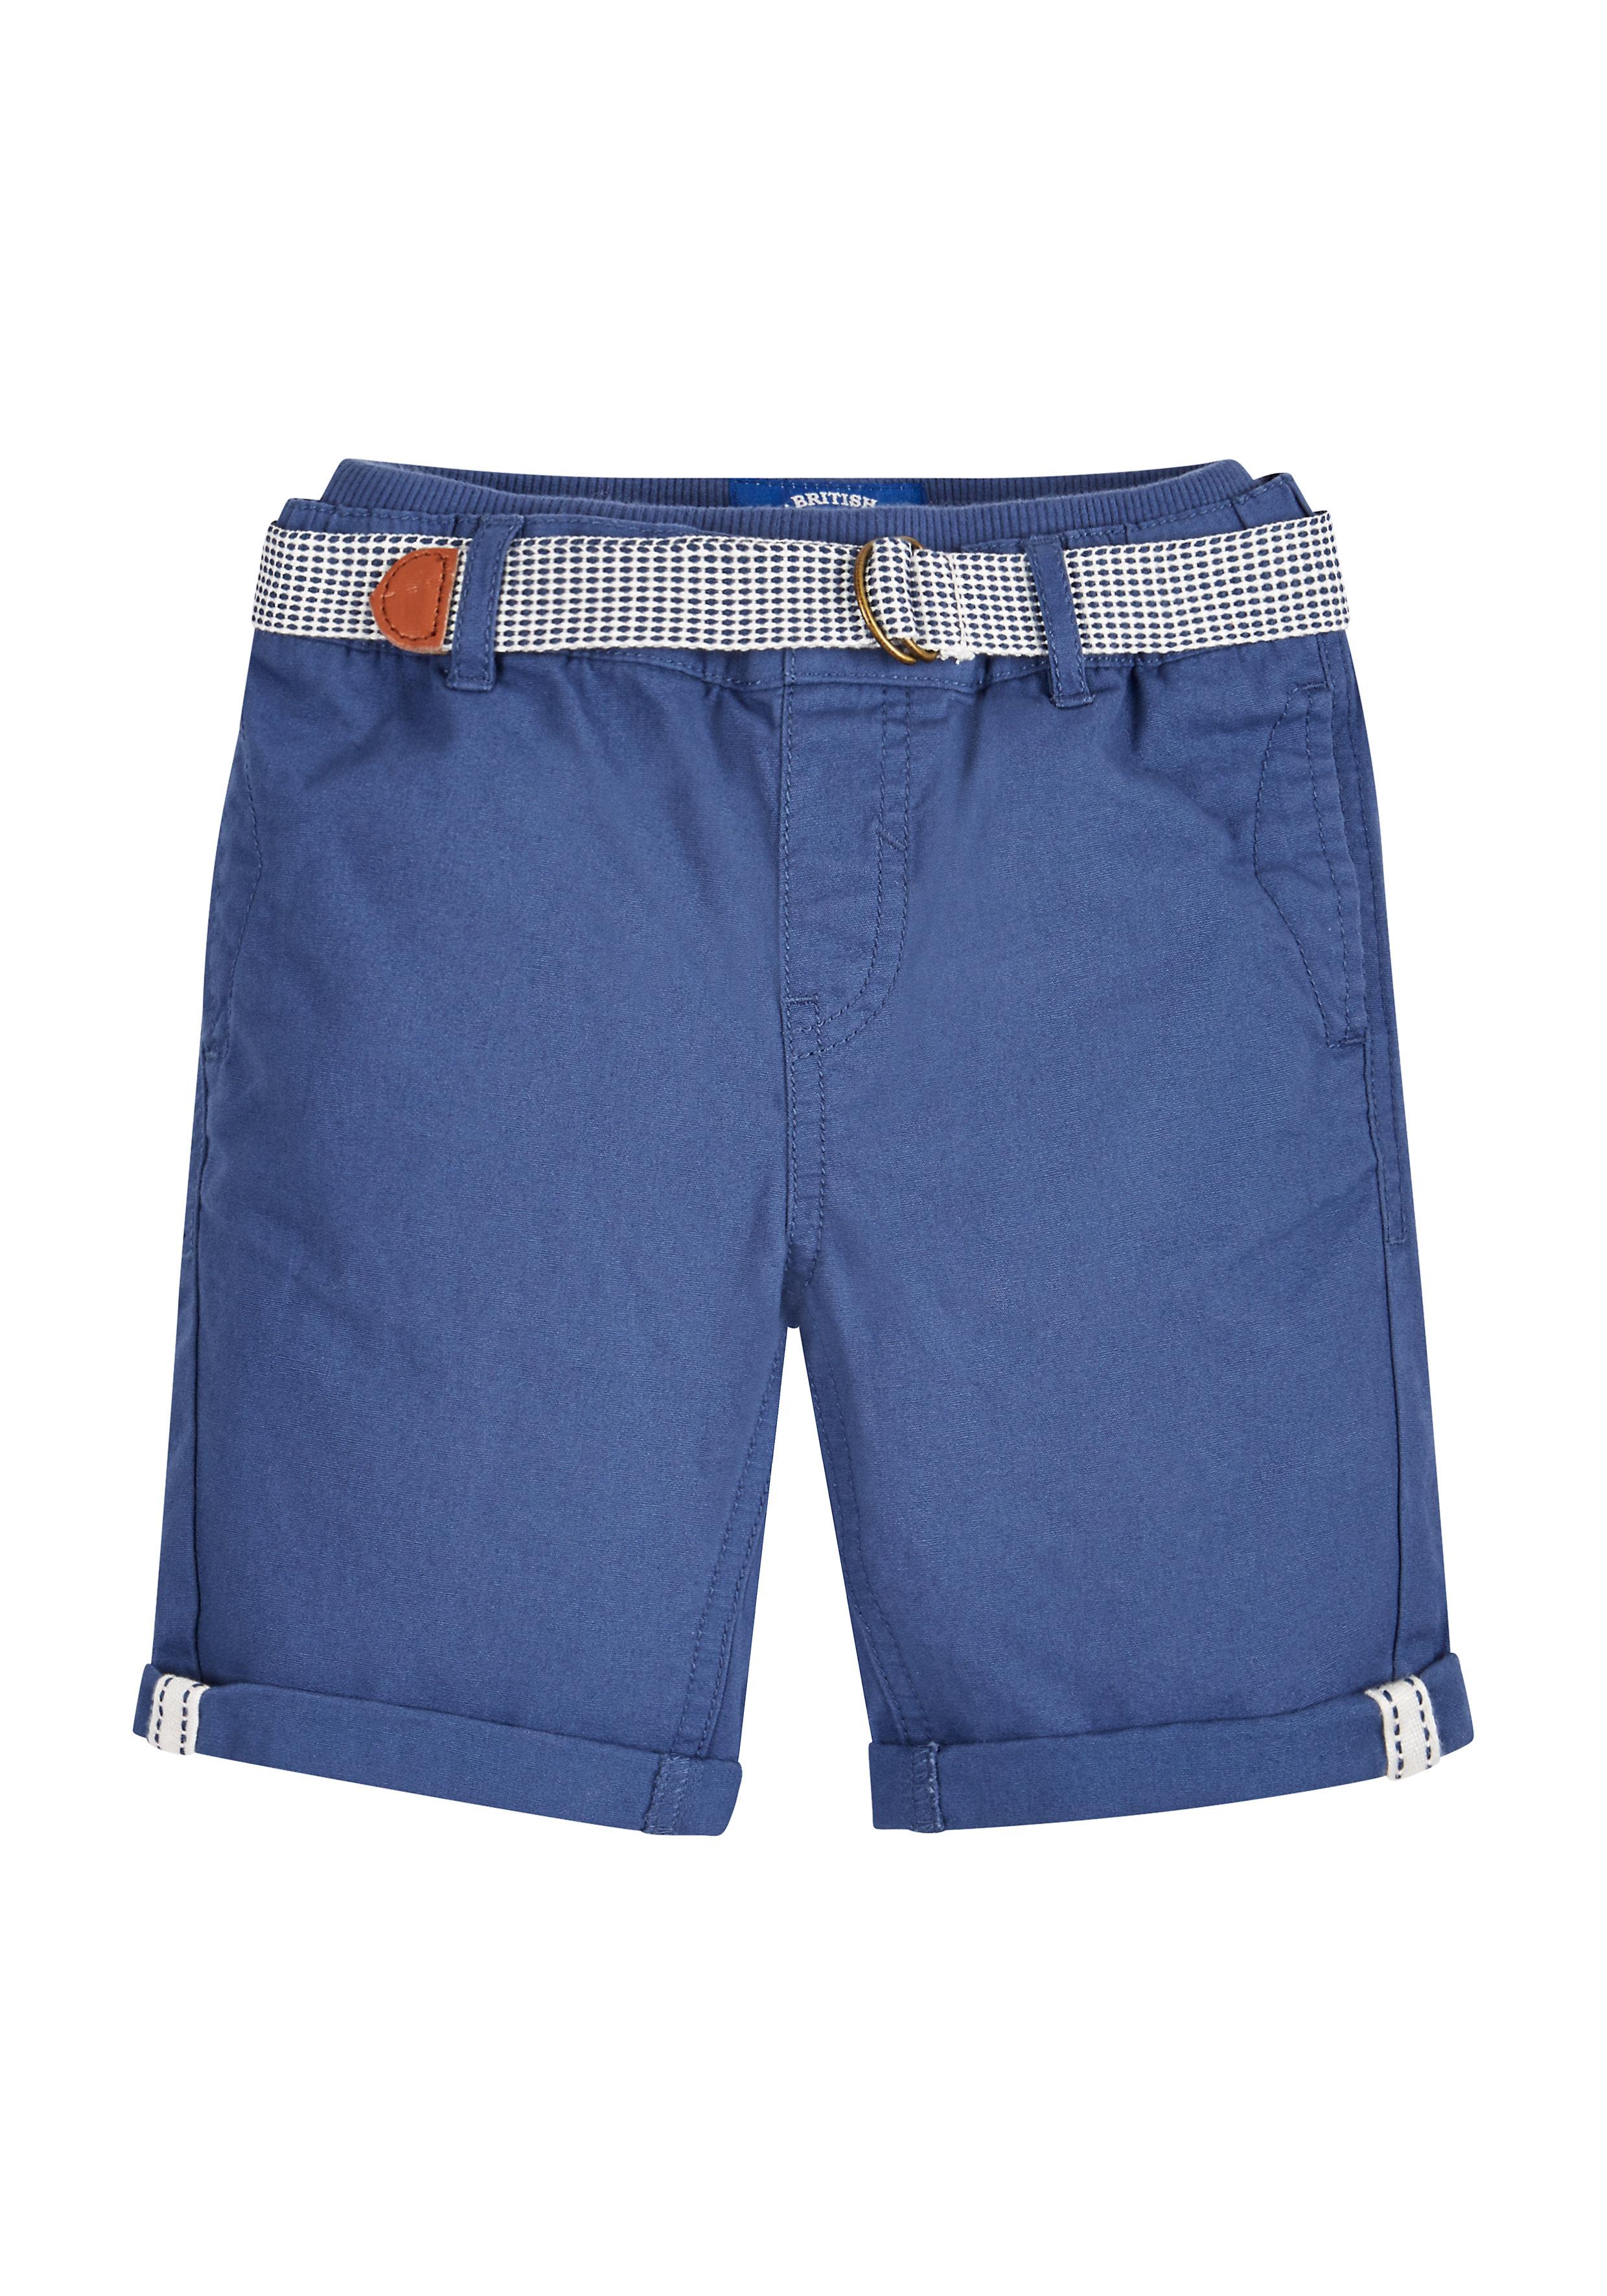 Mothercare   Boys Ribbed Waist Shorts - Navy